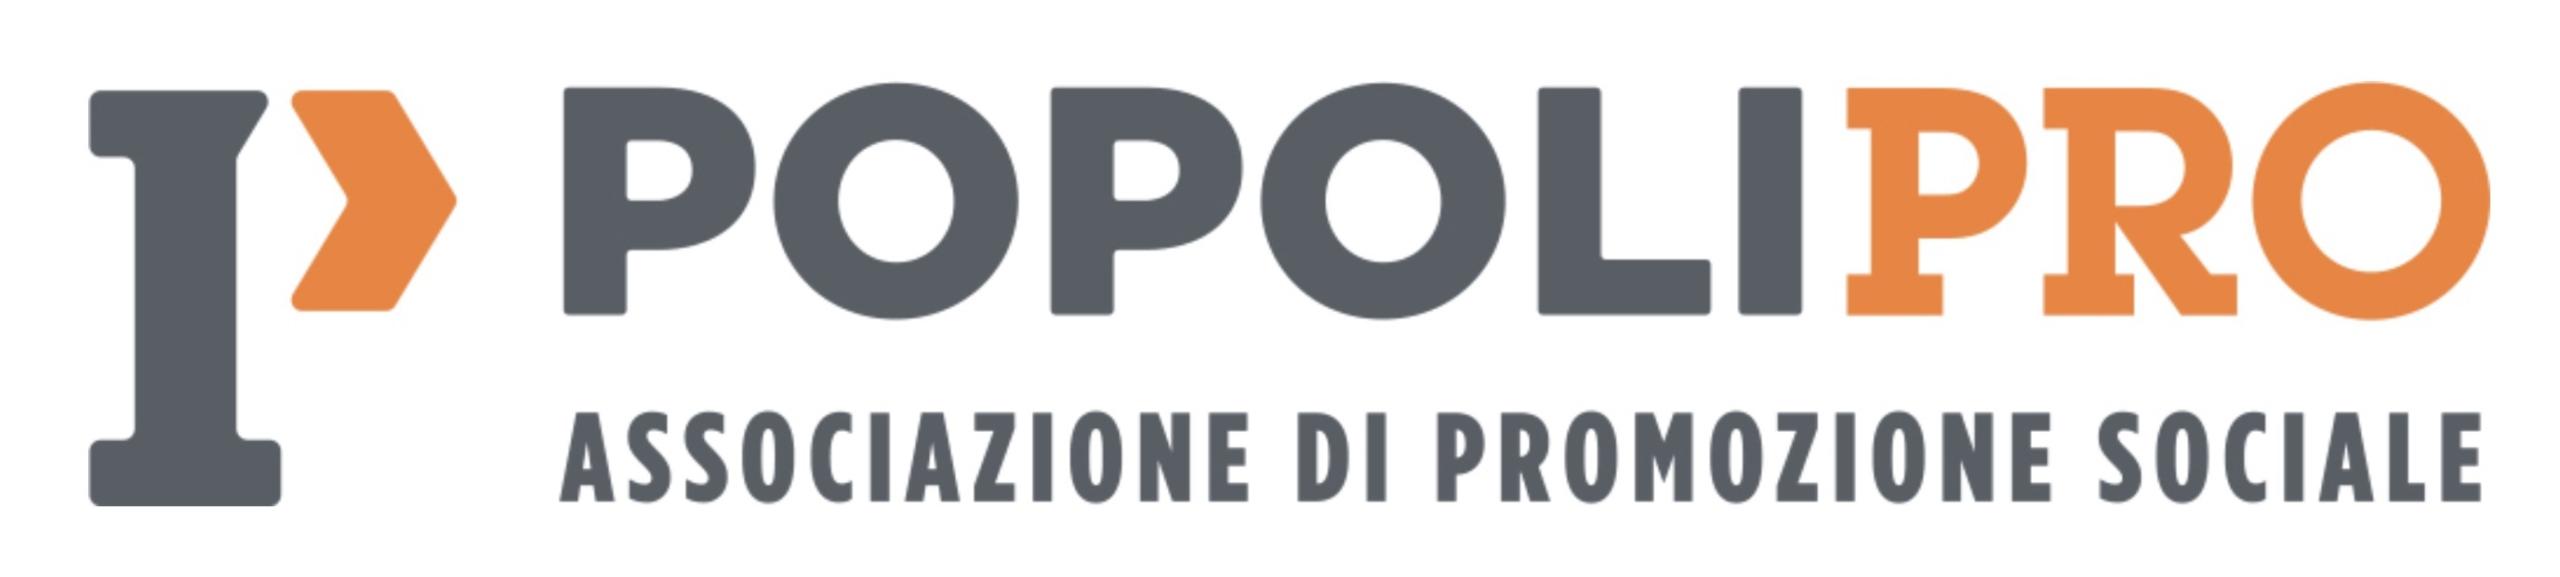 PopoliPro